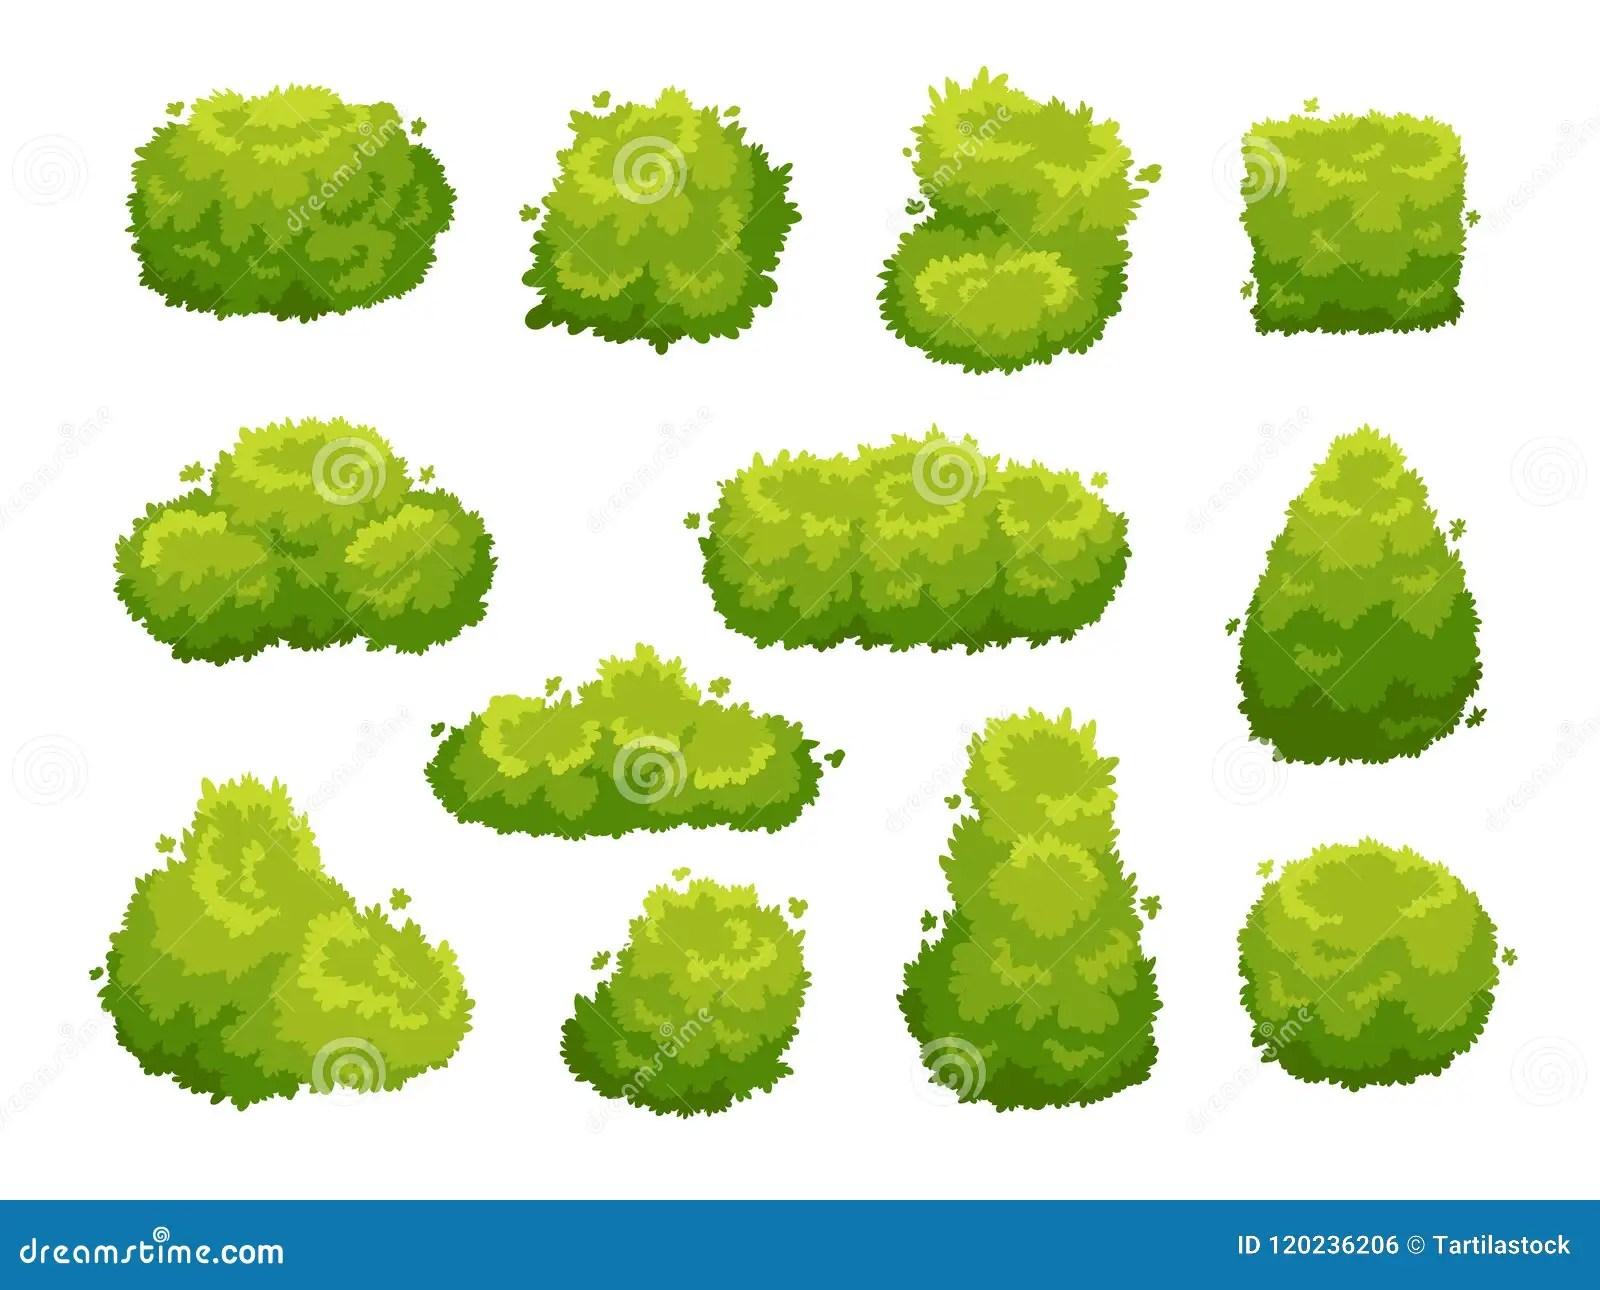 Garden Bush. Green Garden Vegetation Bushes. Cartoon